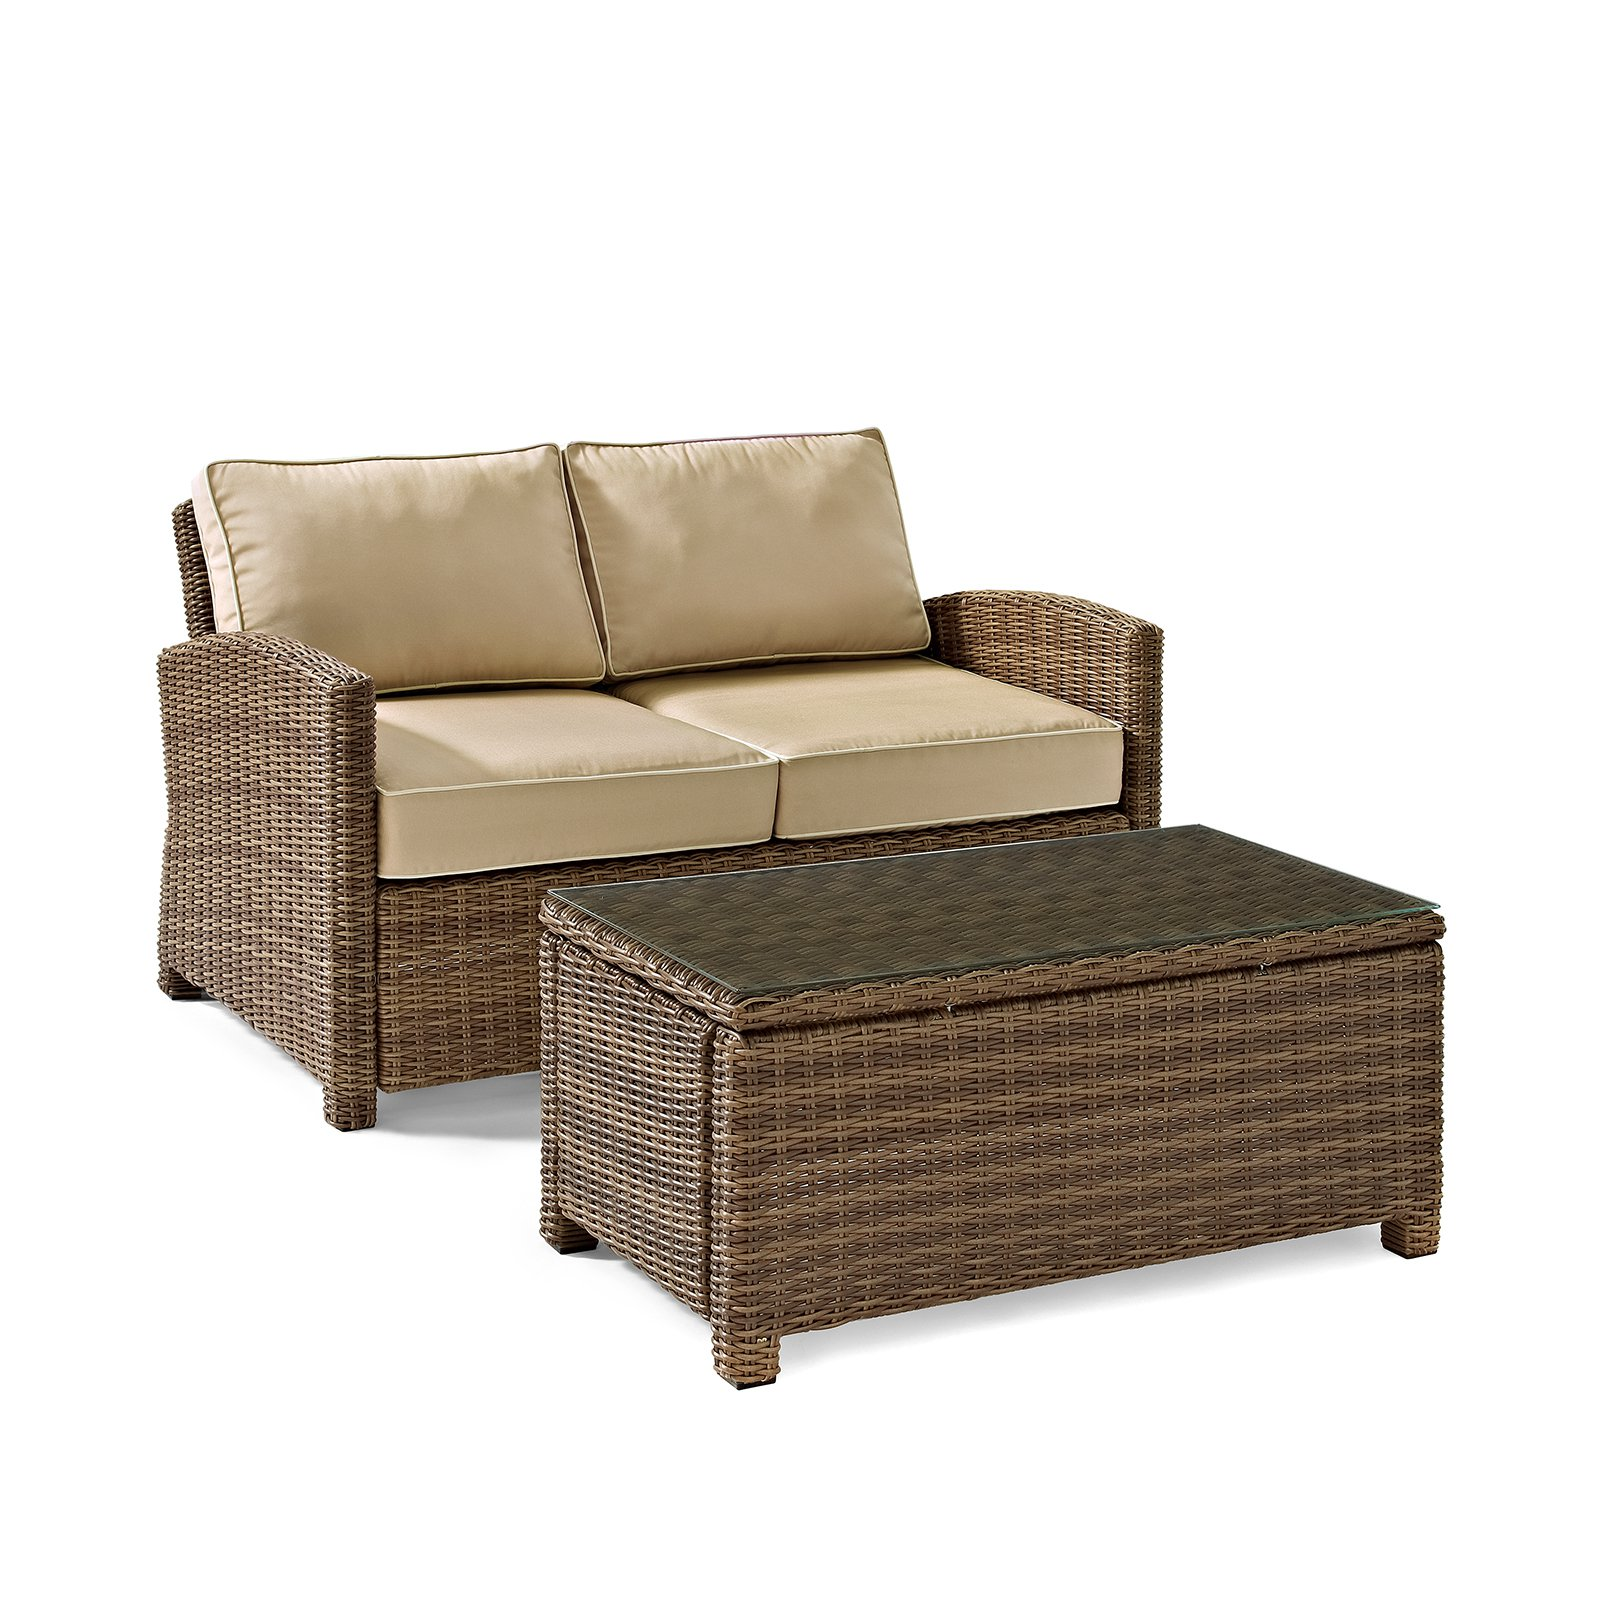 outdoor sofa small space sets WEDYRGO